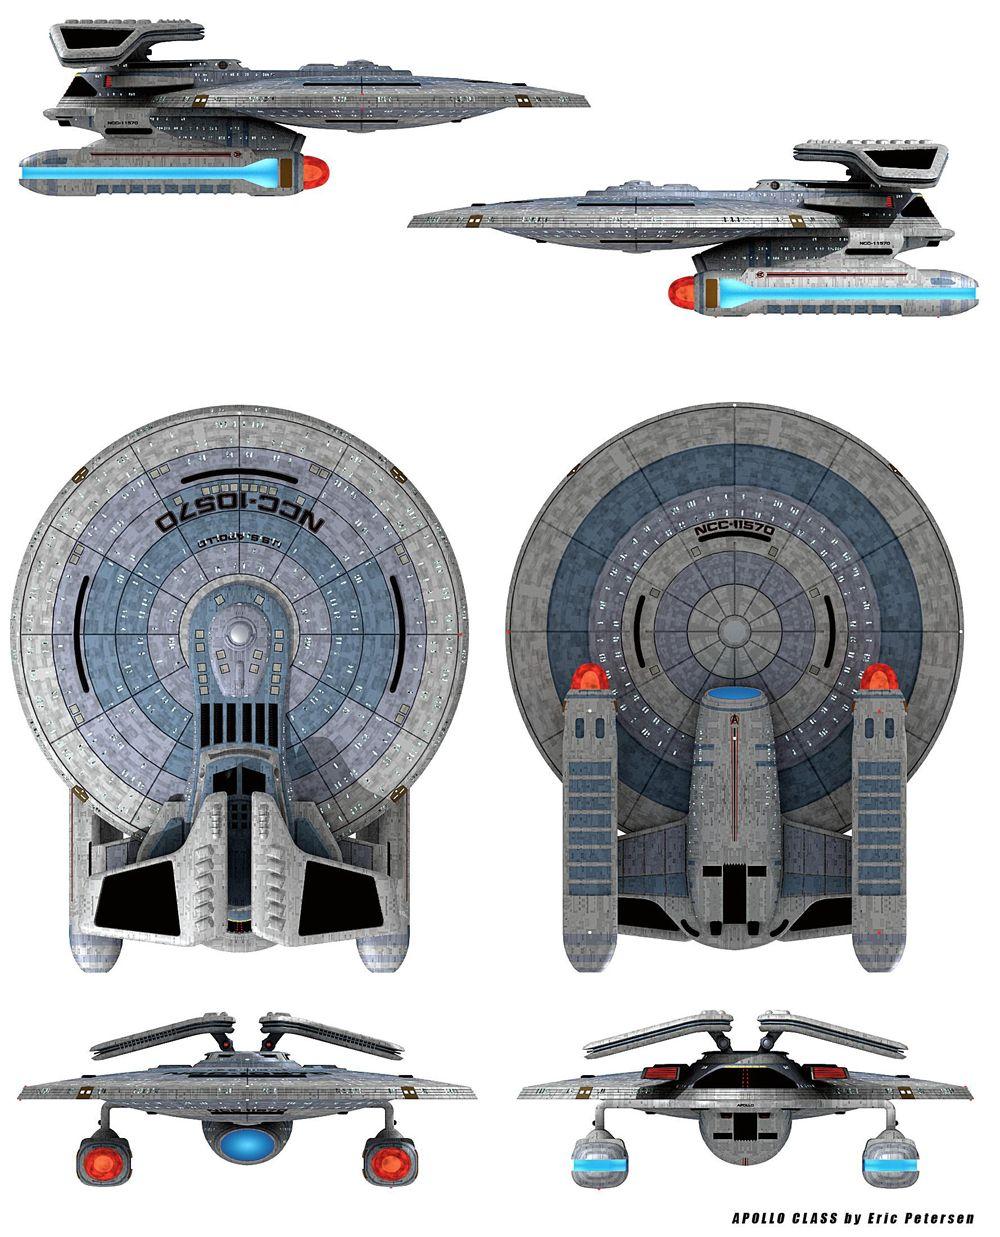 pin federation starfleet class - photo #44